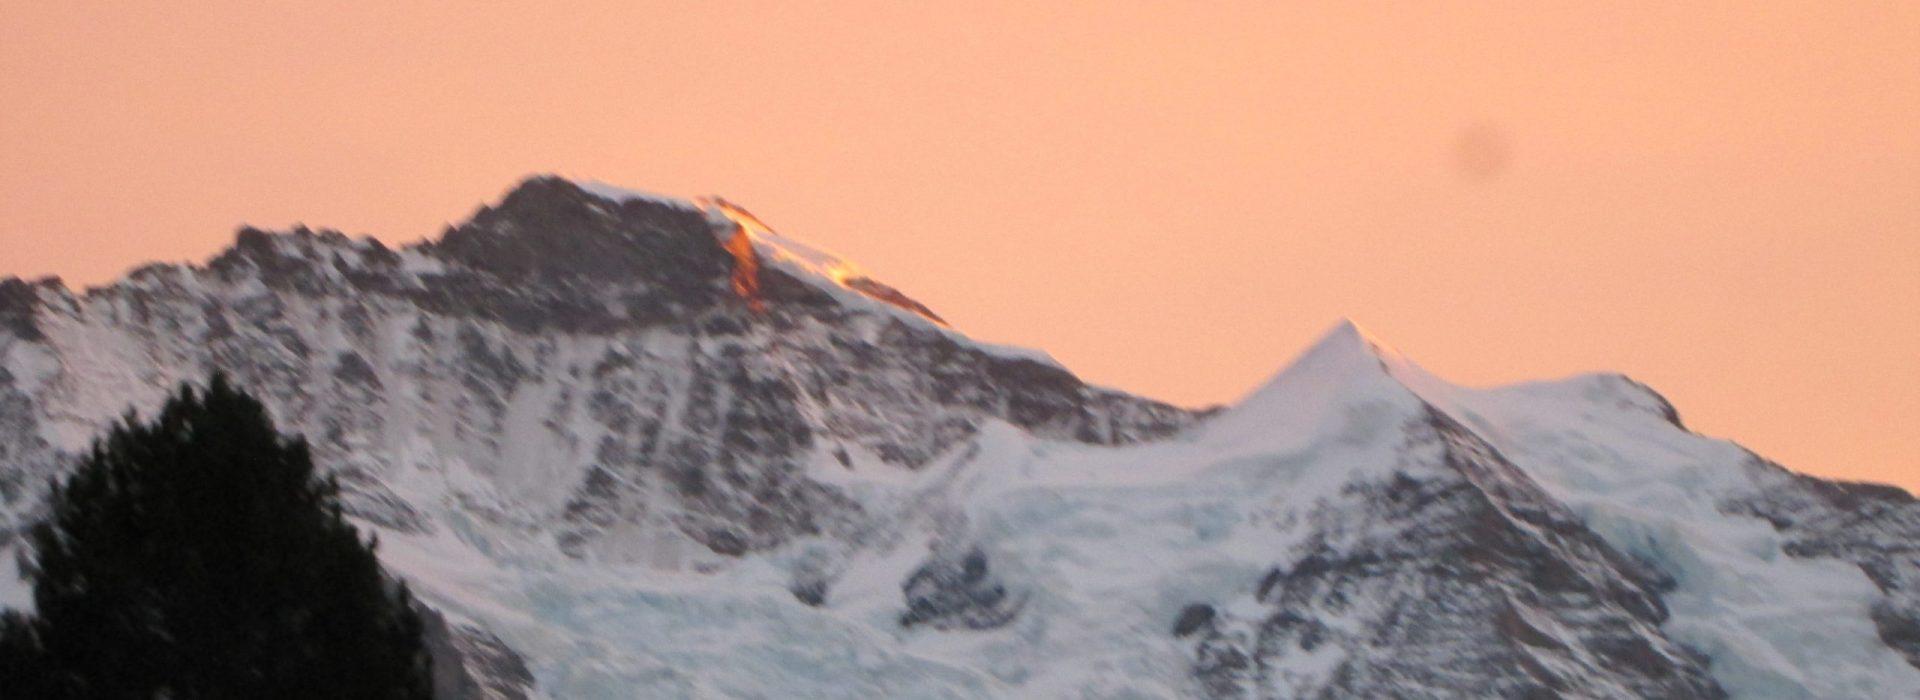 Jungfrau Sunset Picture